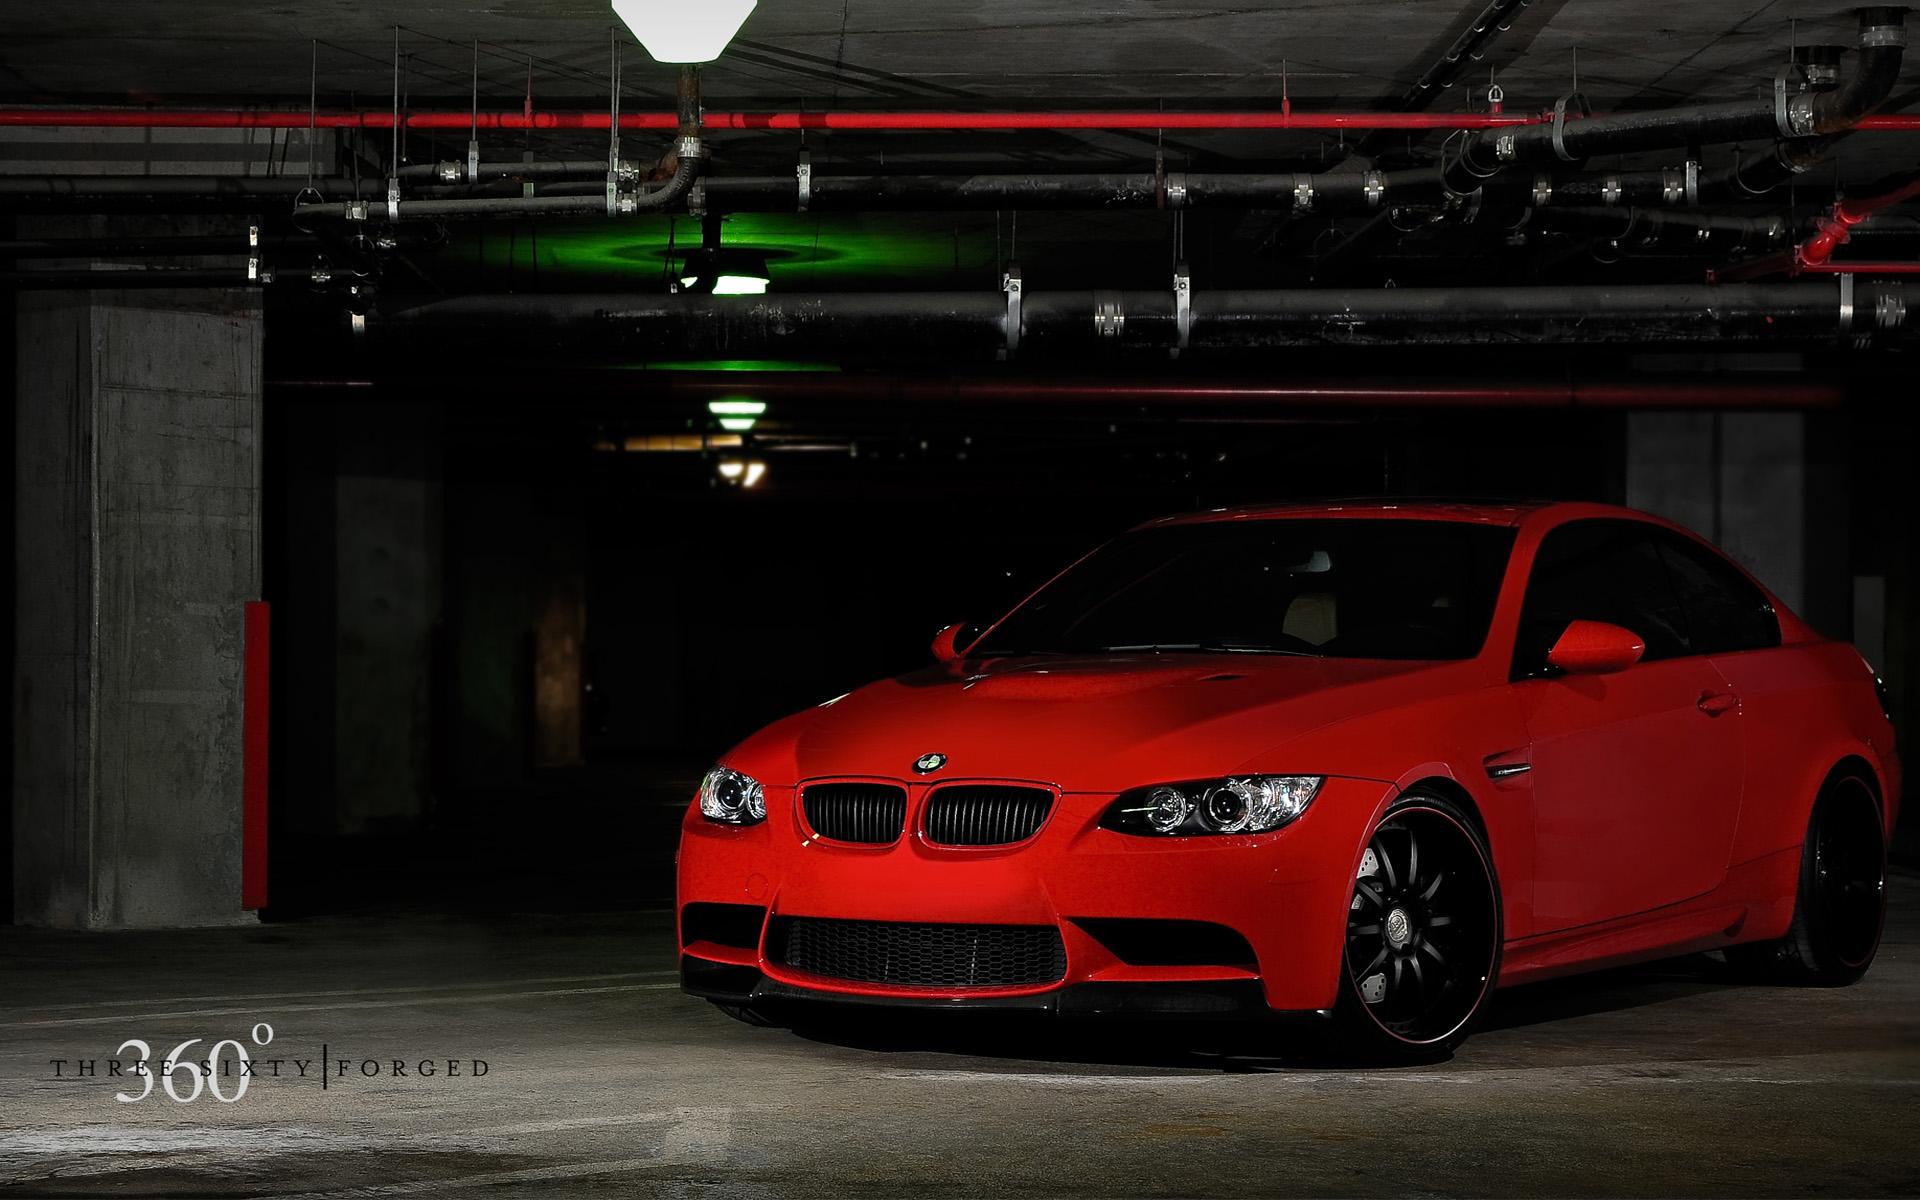 Red Bmw M3 Wallpaper Hd Car Wallpapers Id 2574